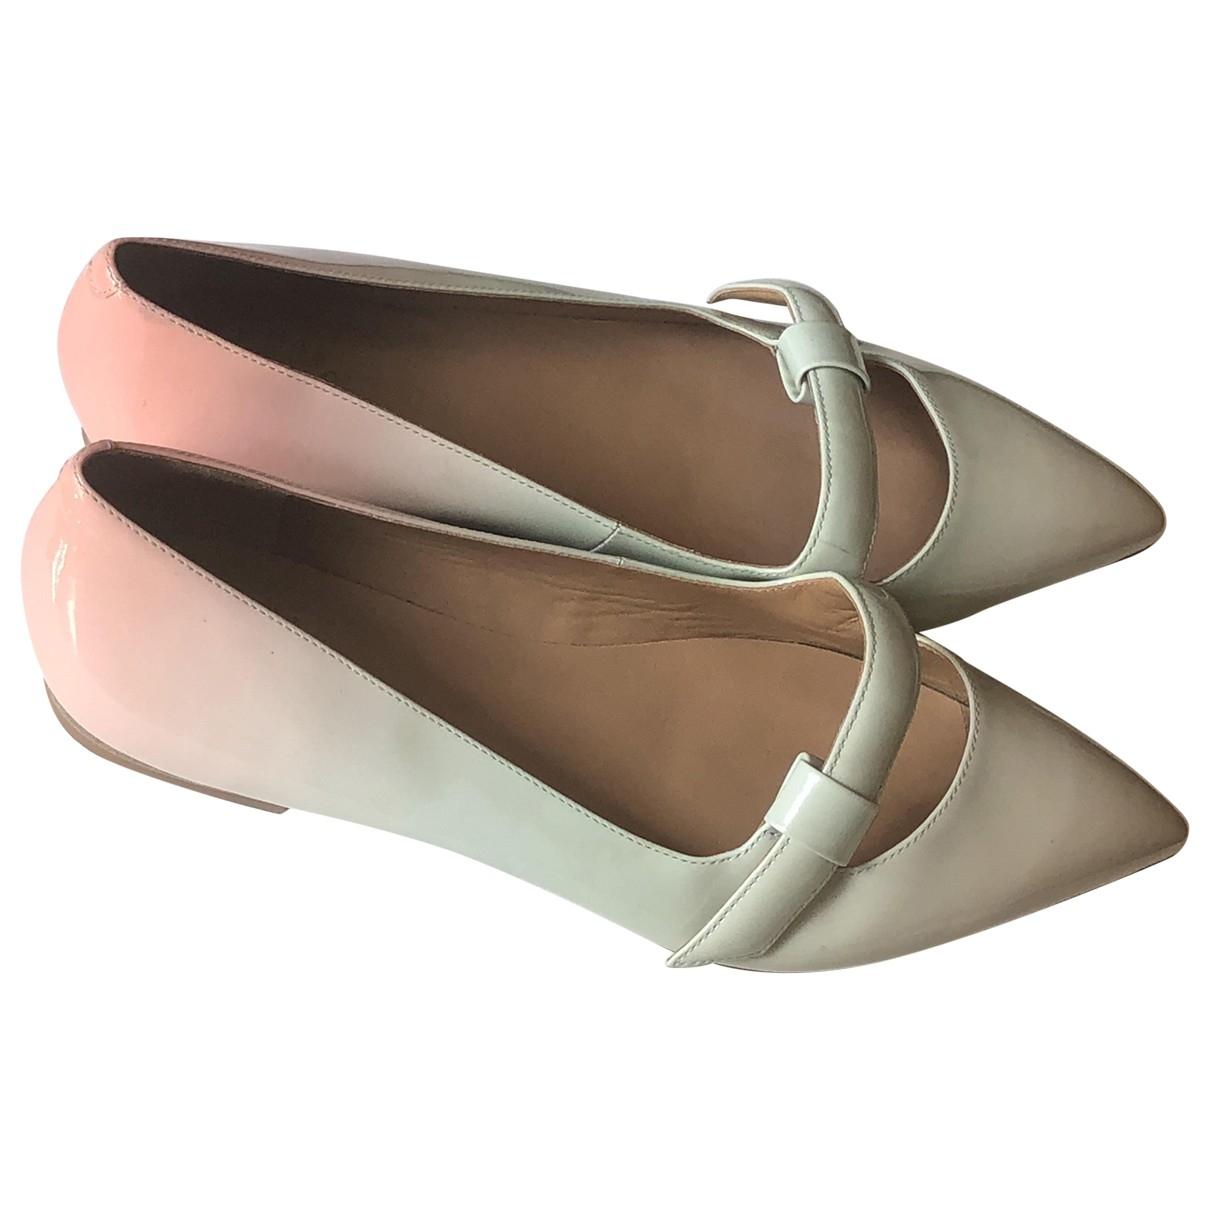 Marc By Marc Jacobs \N Multicolour Patent leather Ballet flats for Women 37 EU